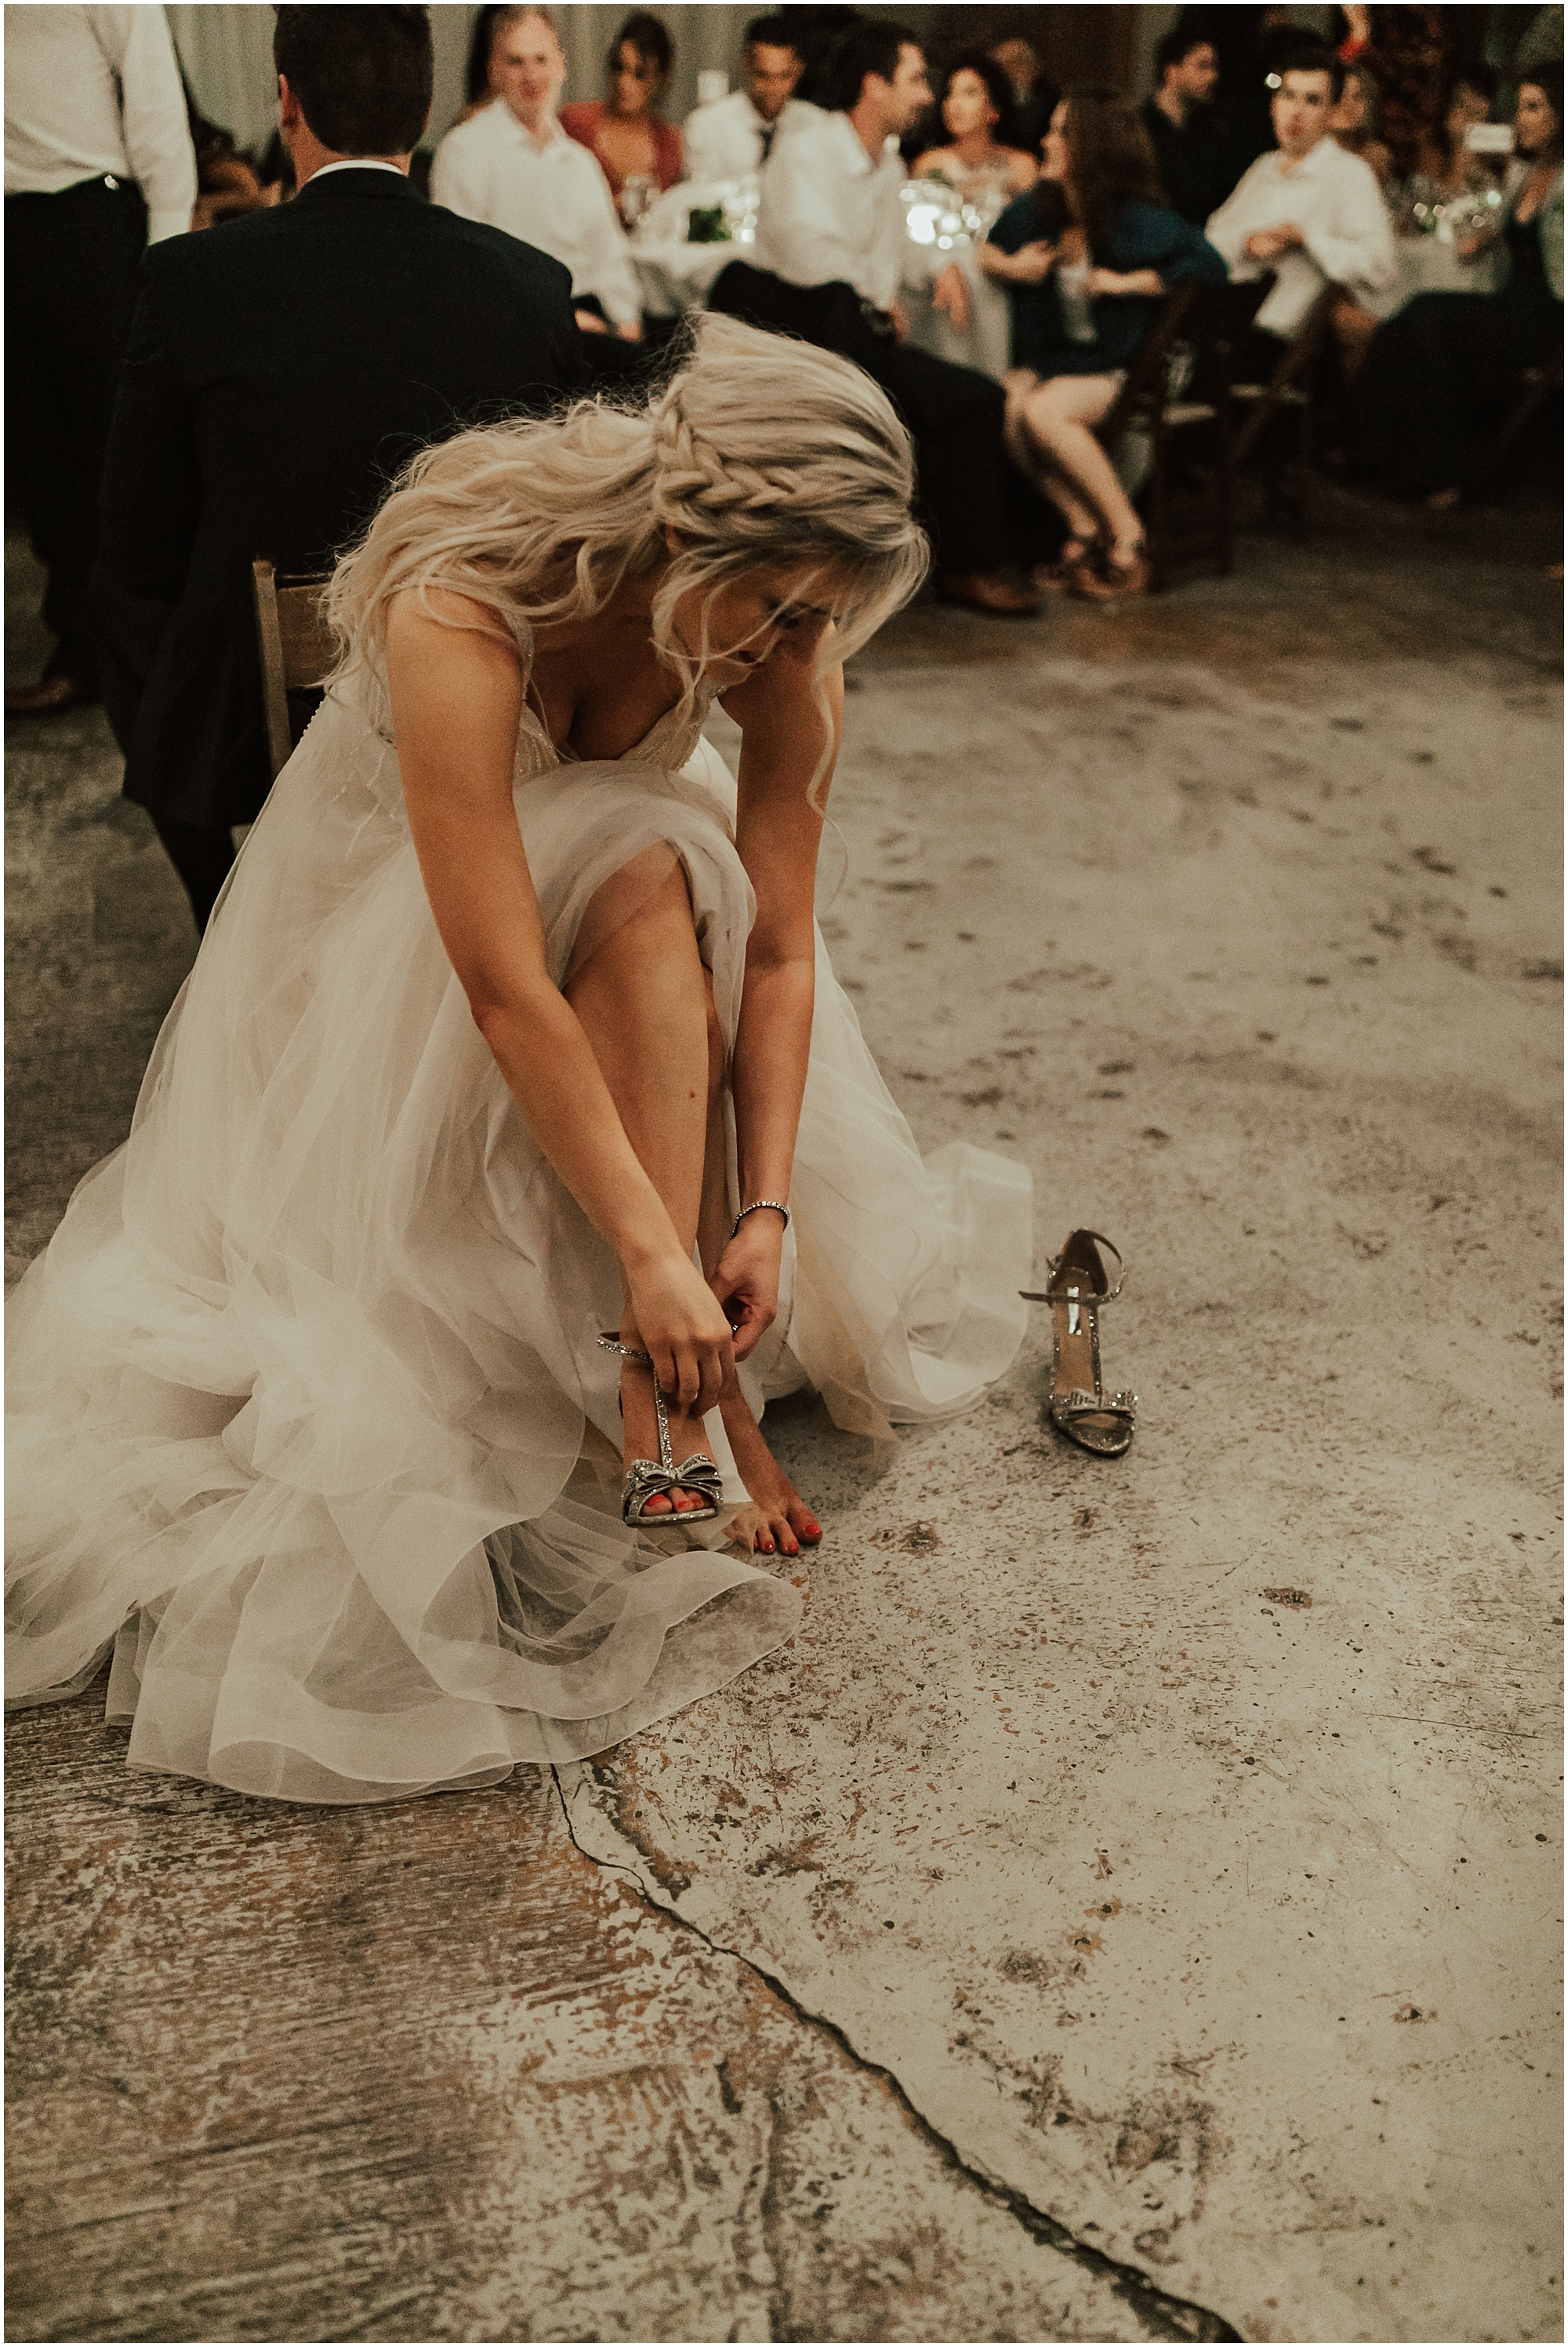 Chateau Rive Spokane Wedding Cassie Trottier Photography1159.jpg